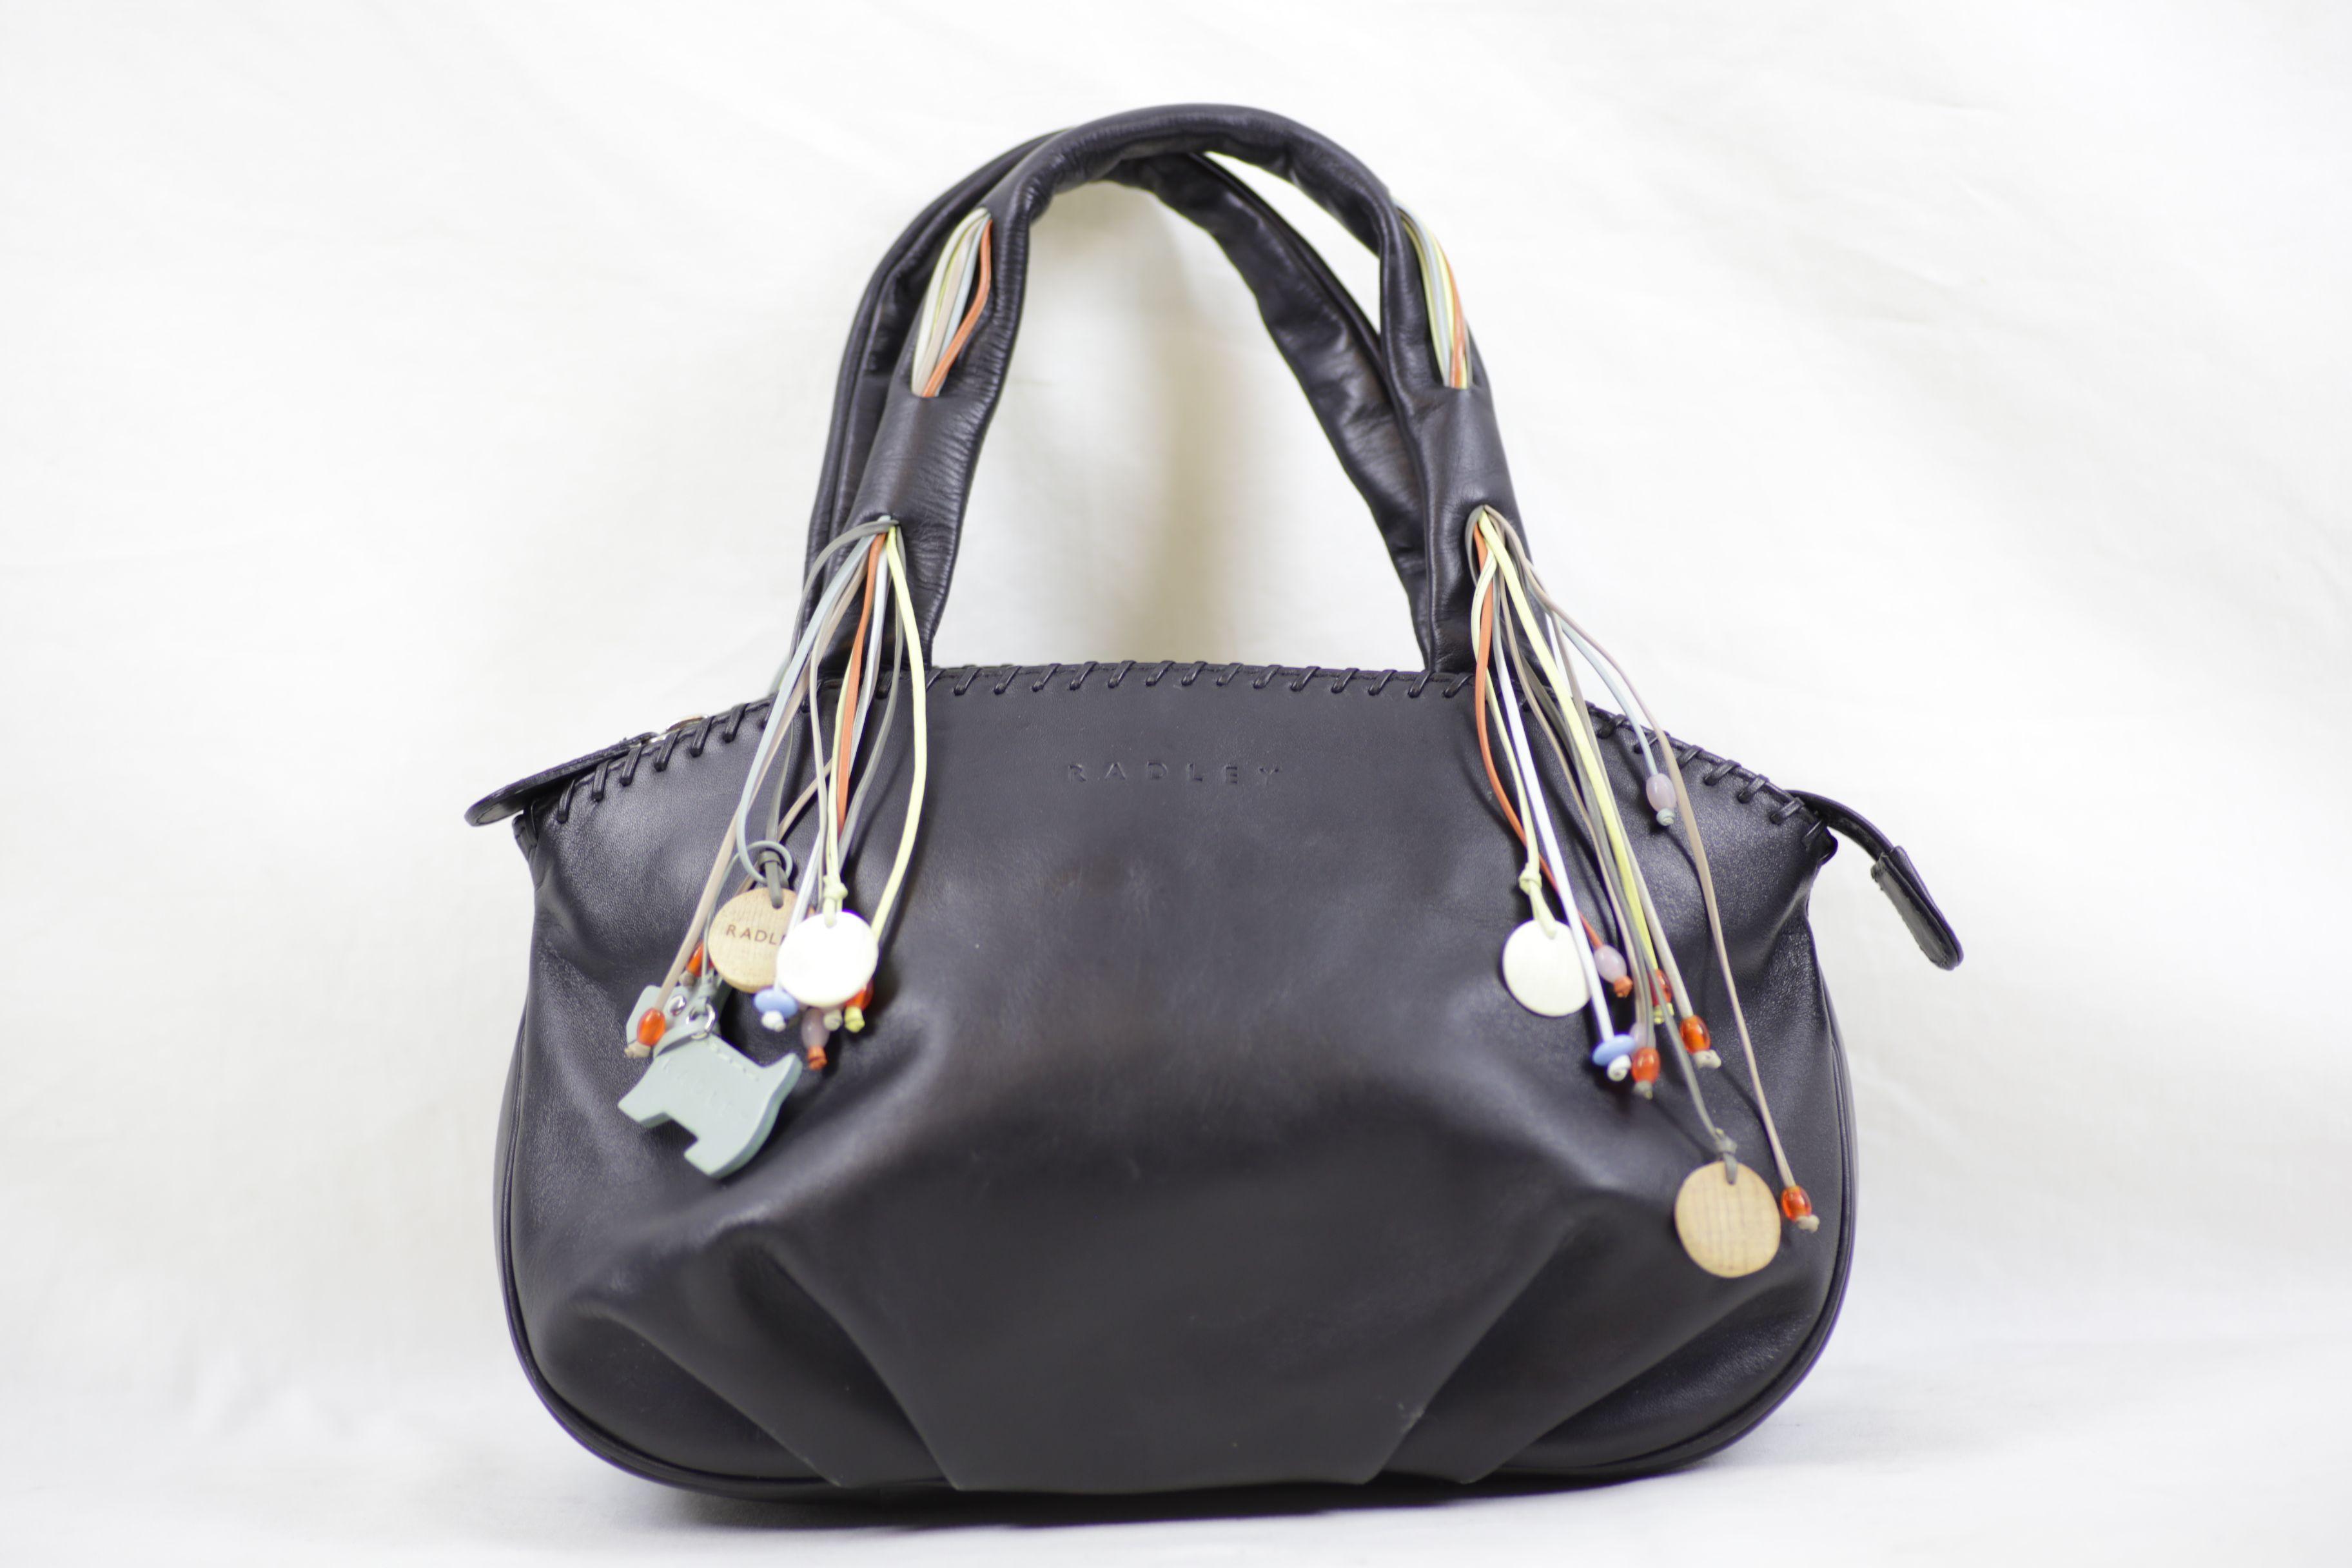 Radley Small Black Leather Tasseled Handbag with Beads